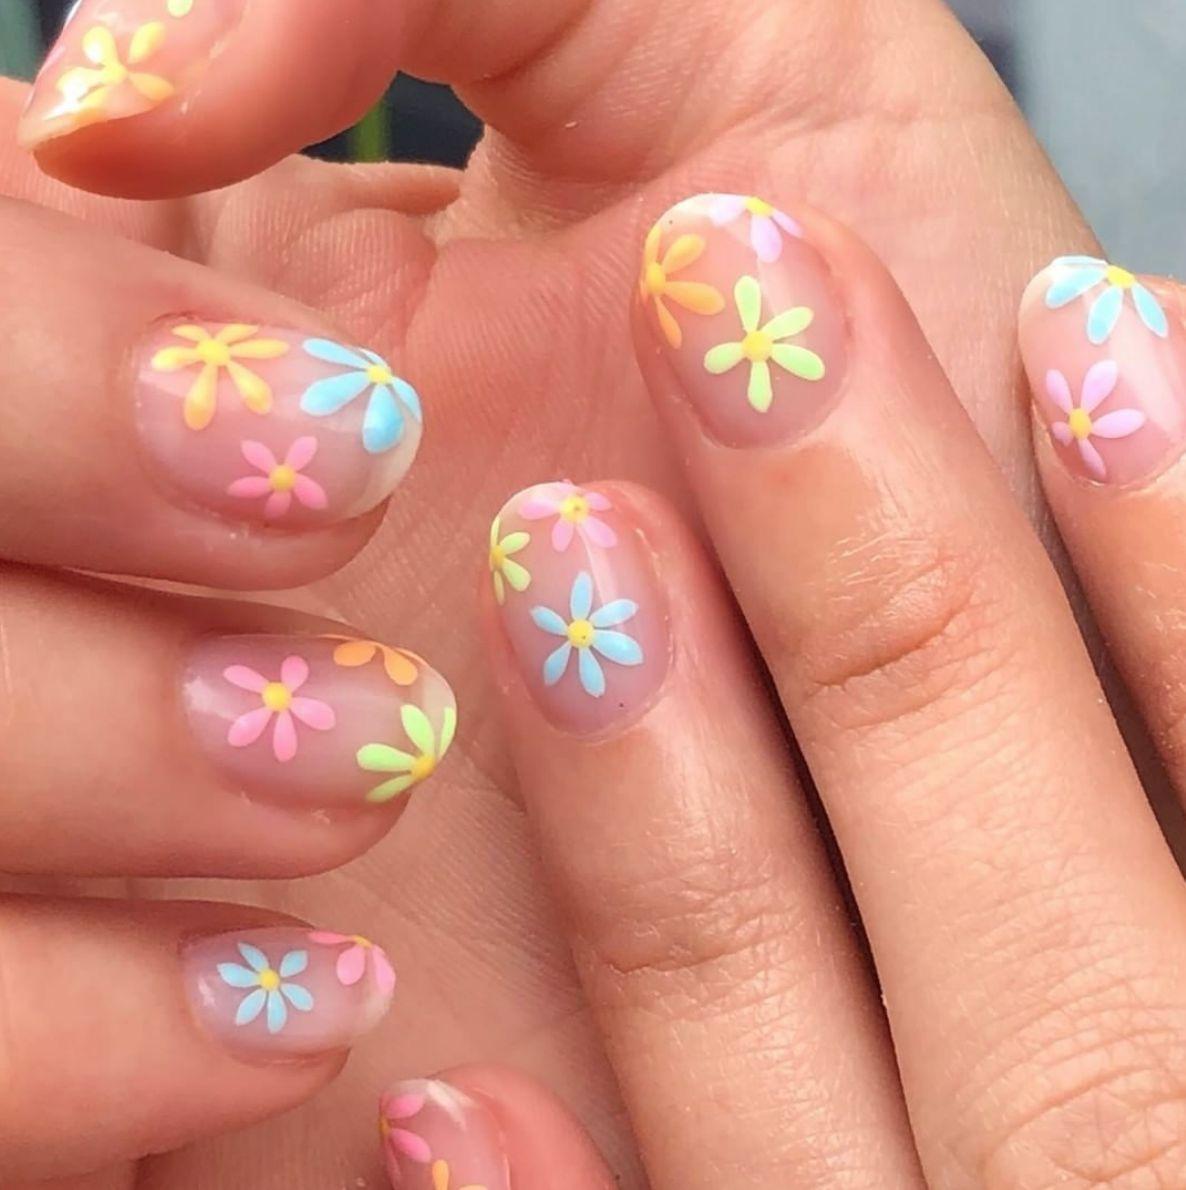 Pin By Lily Bear On Nails In 2020 Minimalist Nails Cute Nails Cute Acrylic Nails